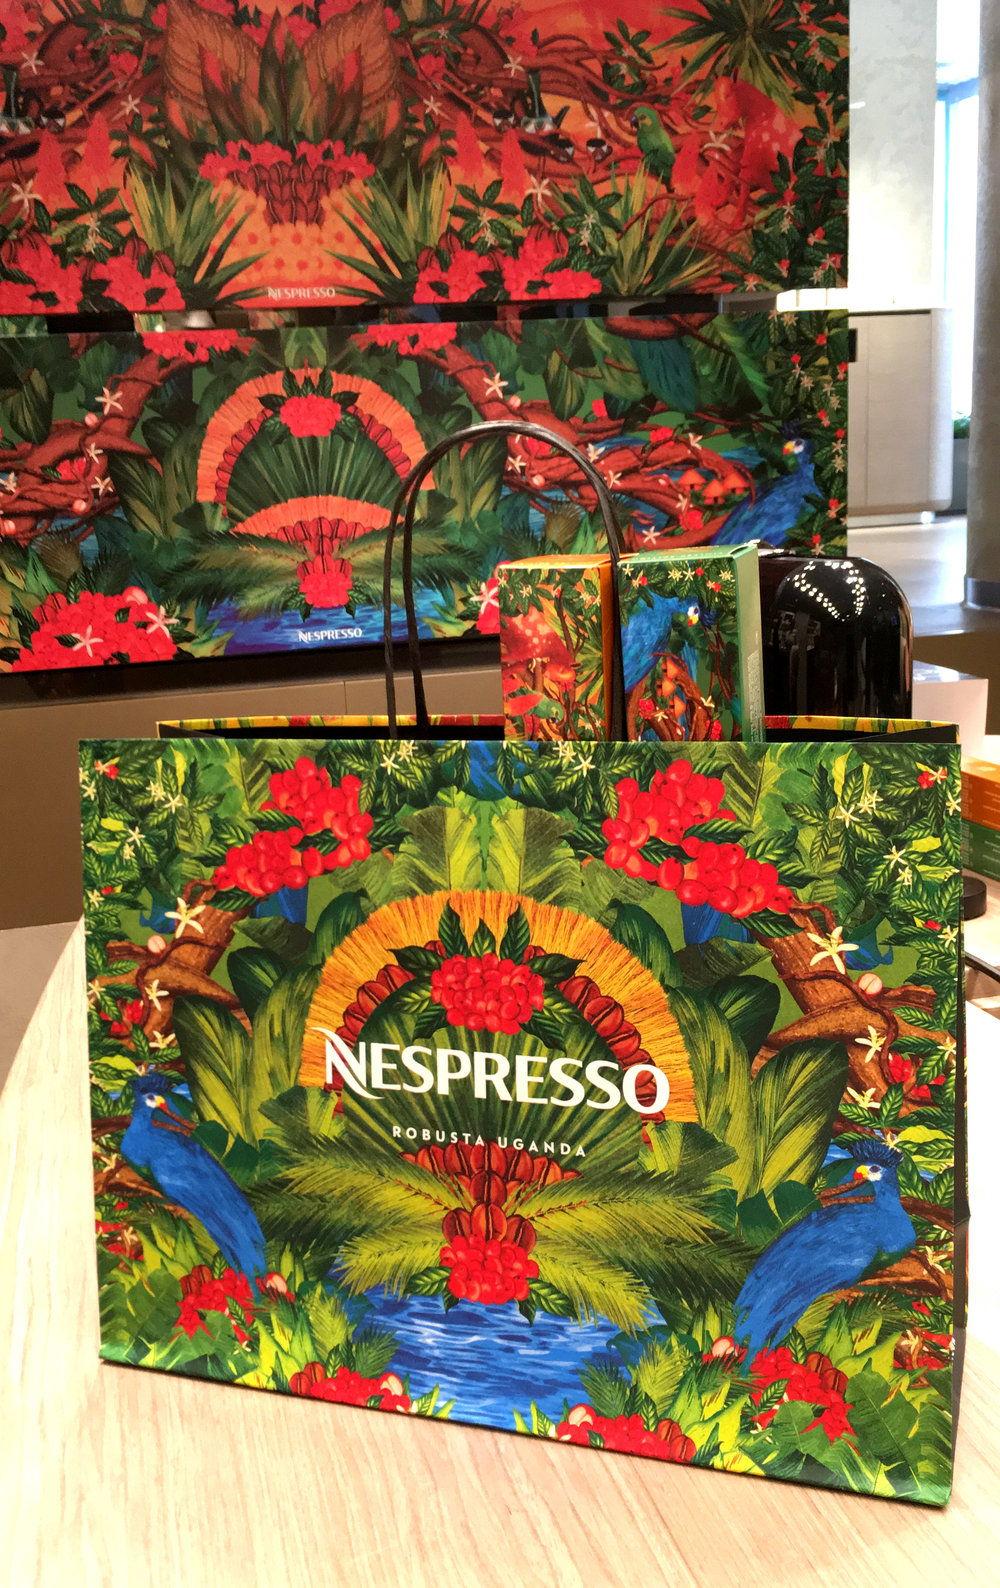 mariana-rodrigues-nespresso-packaging-12.jpg